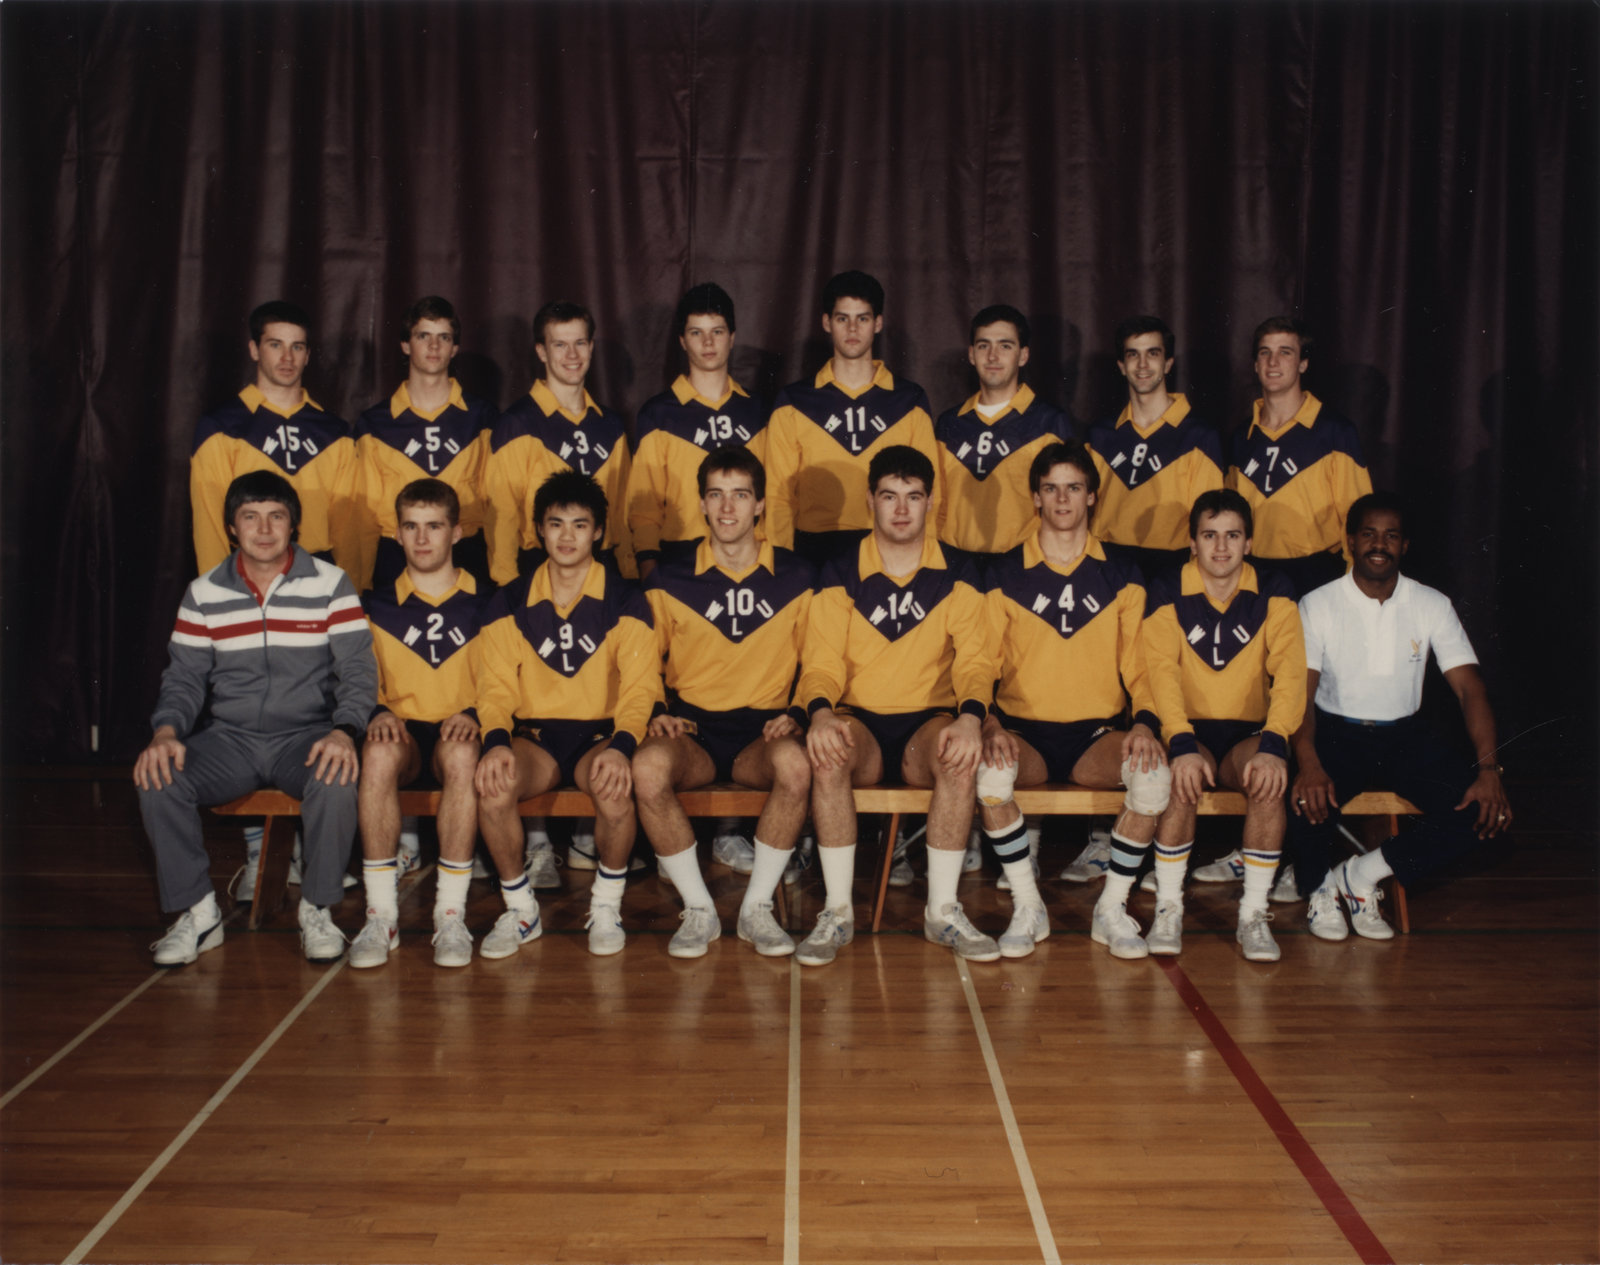 Wilfrid Laurier University men's volleyball team